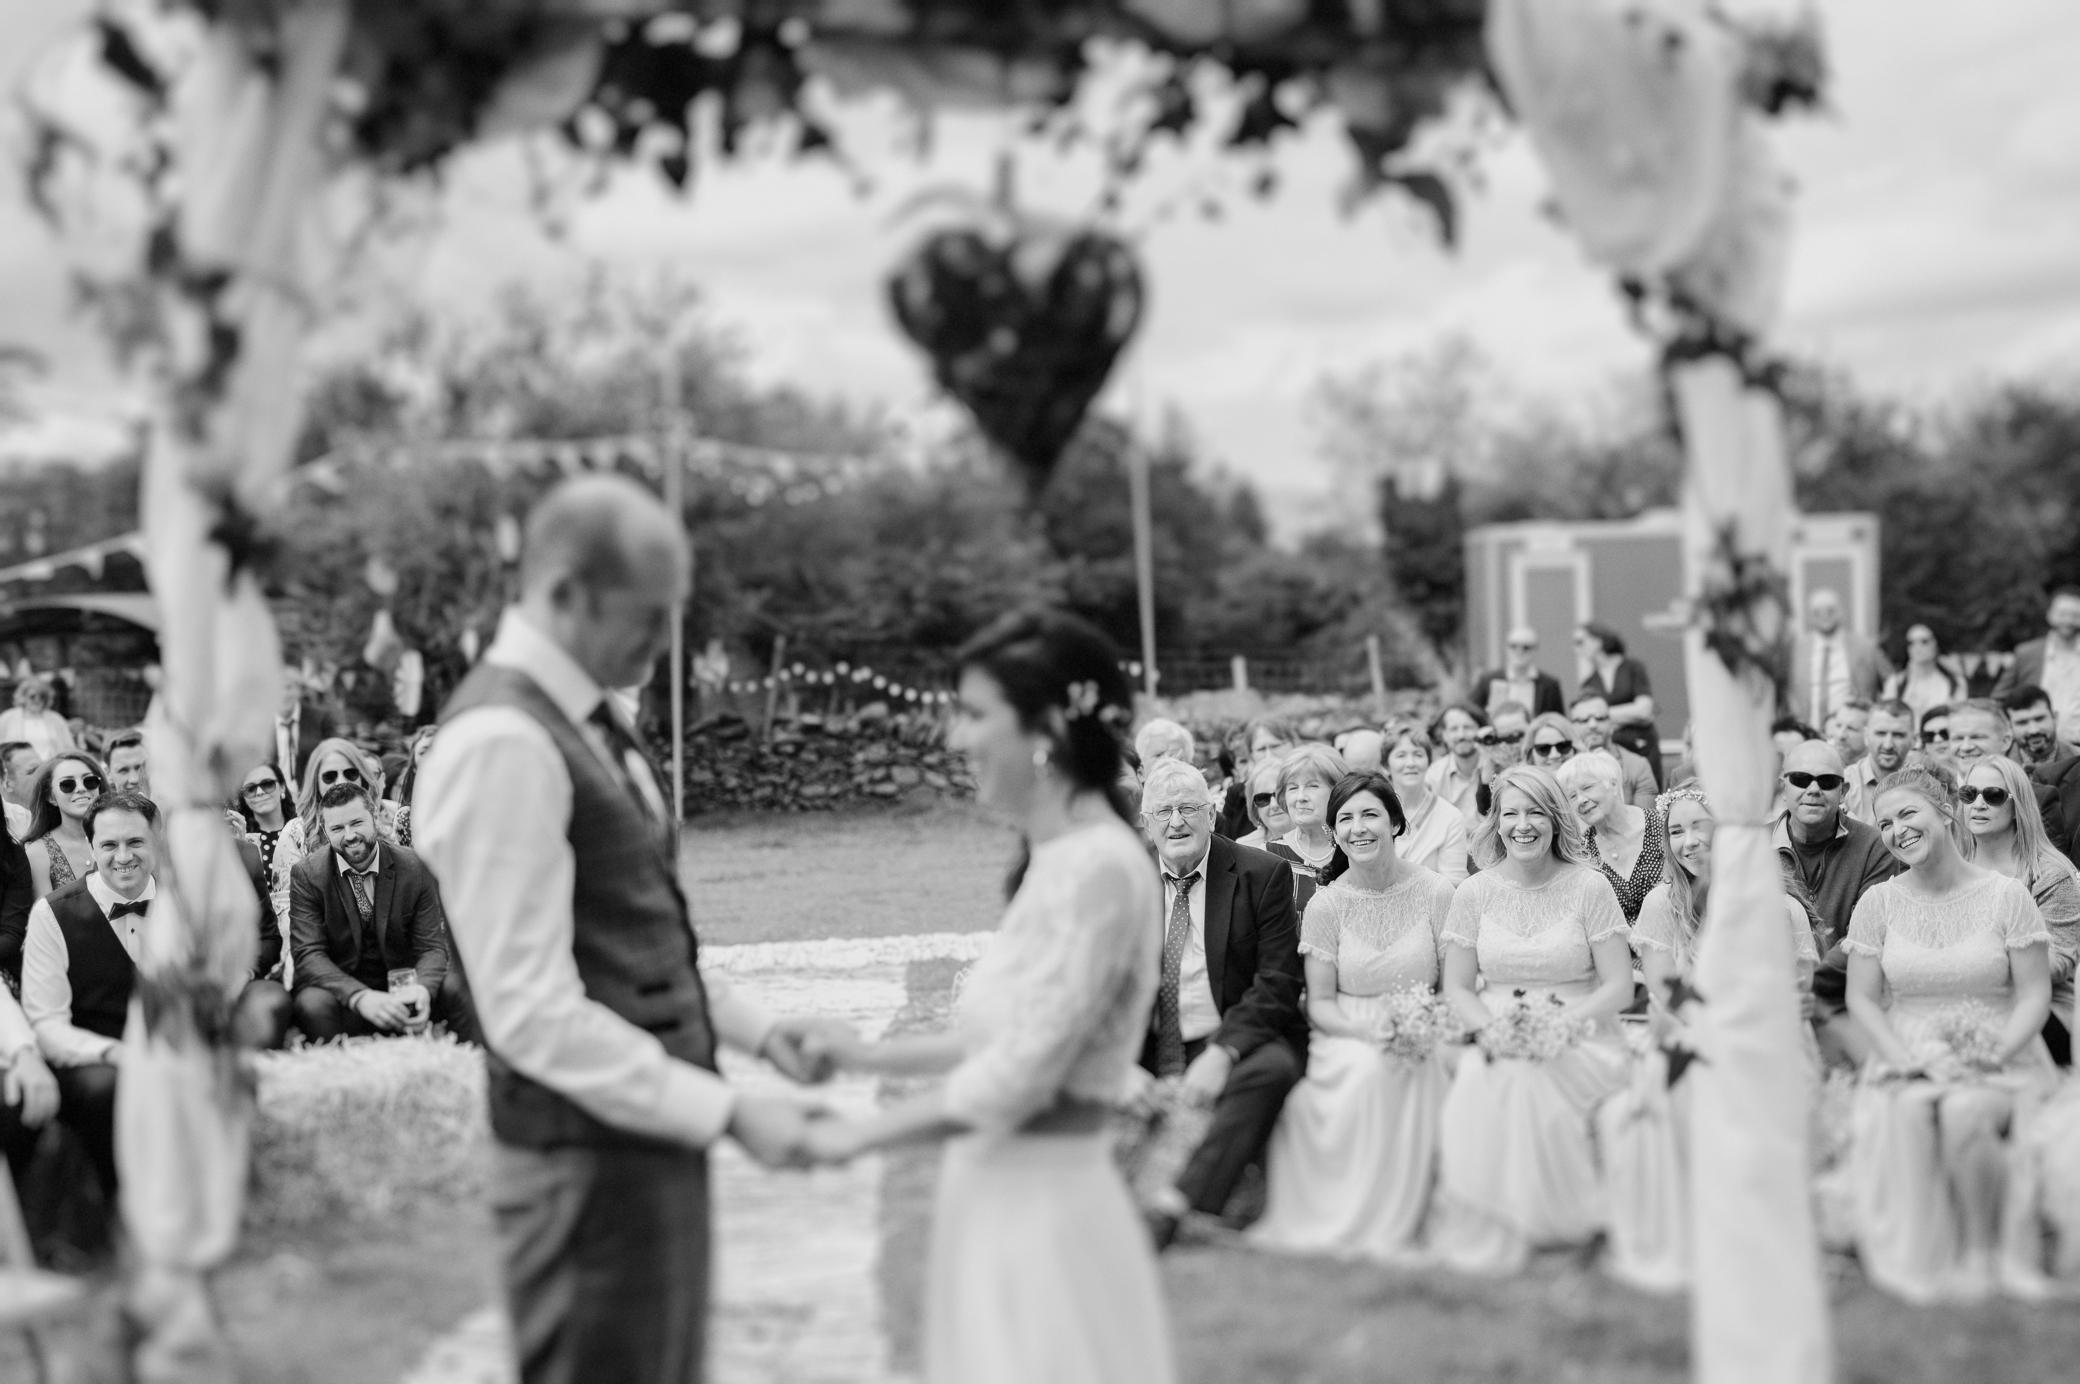 Carmel&Marcus_Wedding photographer Europe-52.jpg